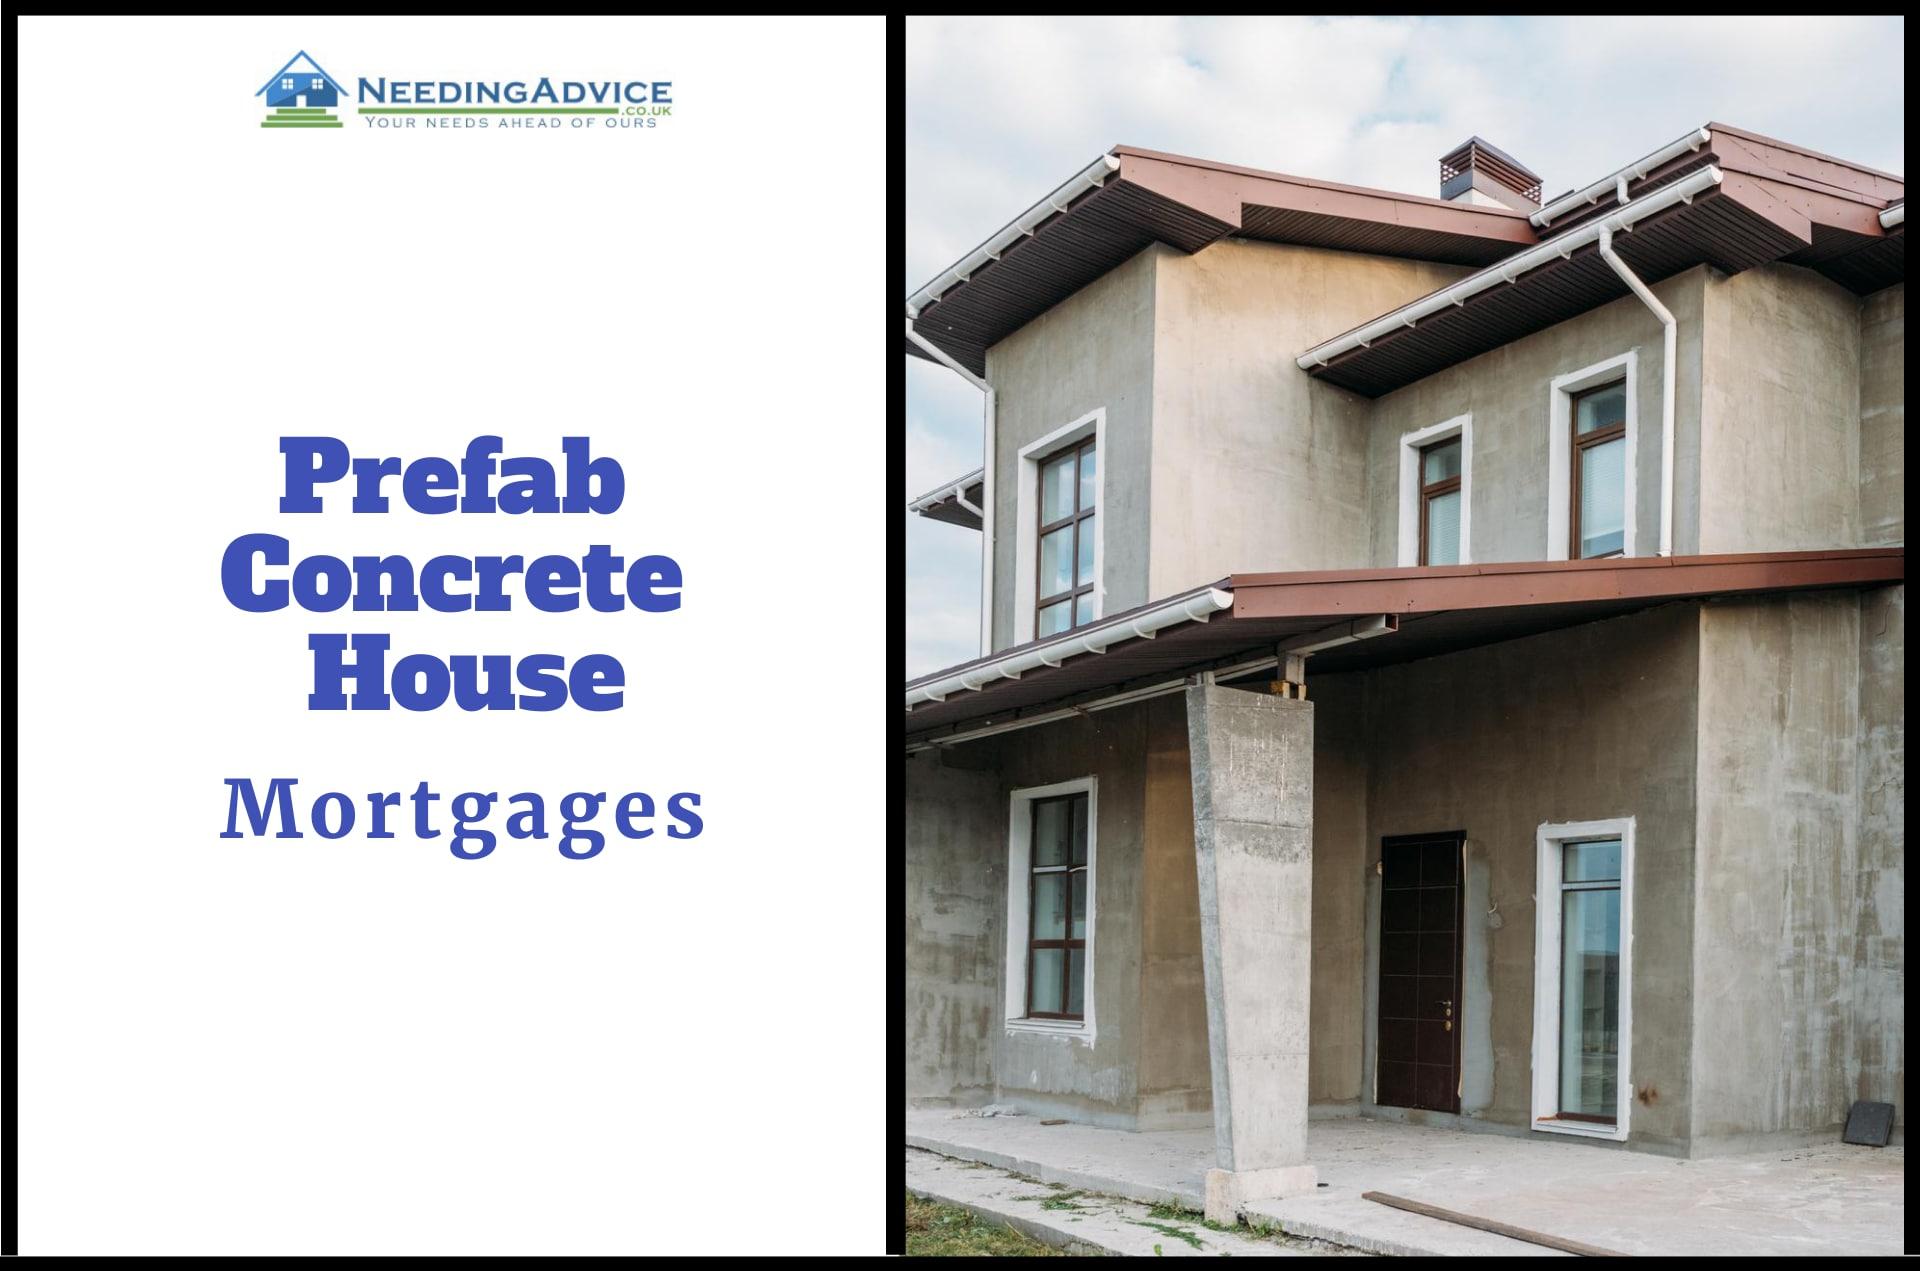 Mortgage for Prefab Concrete House